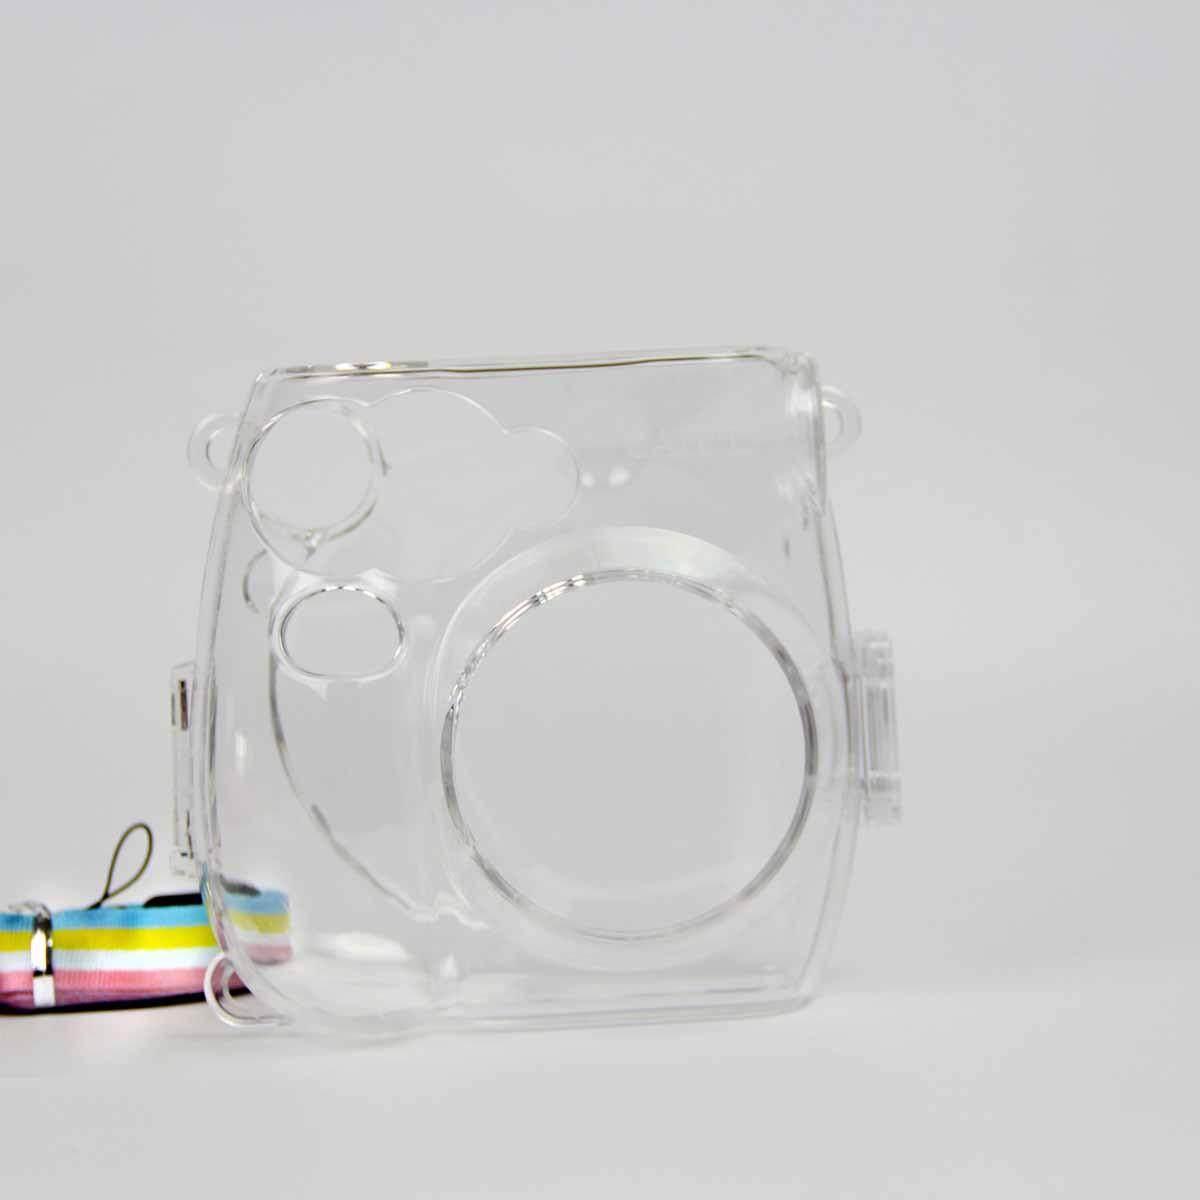 -44%. Honioer Kamera Transparan PC Wadah Penutup untuk ...